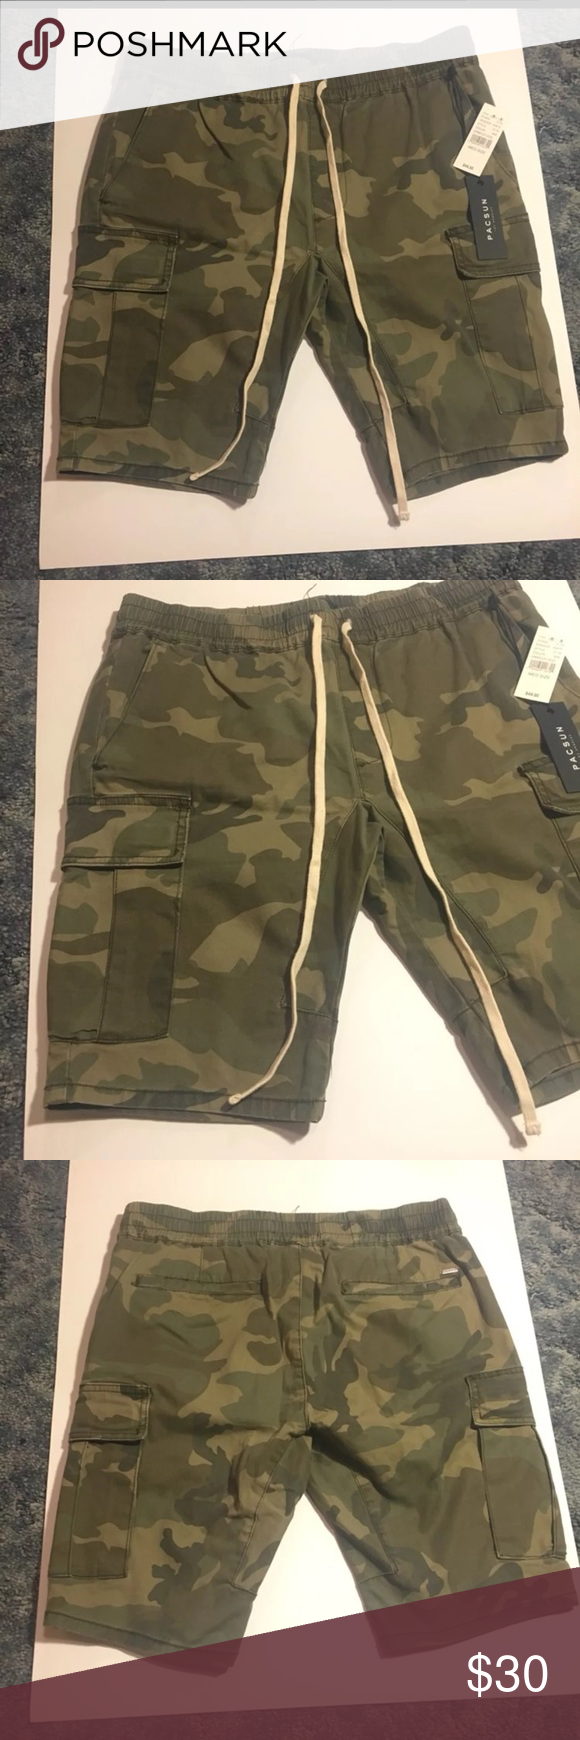 c1a2cf36c7 NWT Men's PacSun Camo Cargo Shorts New with tags PacSun Shorts Cargo ...